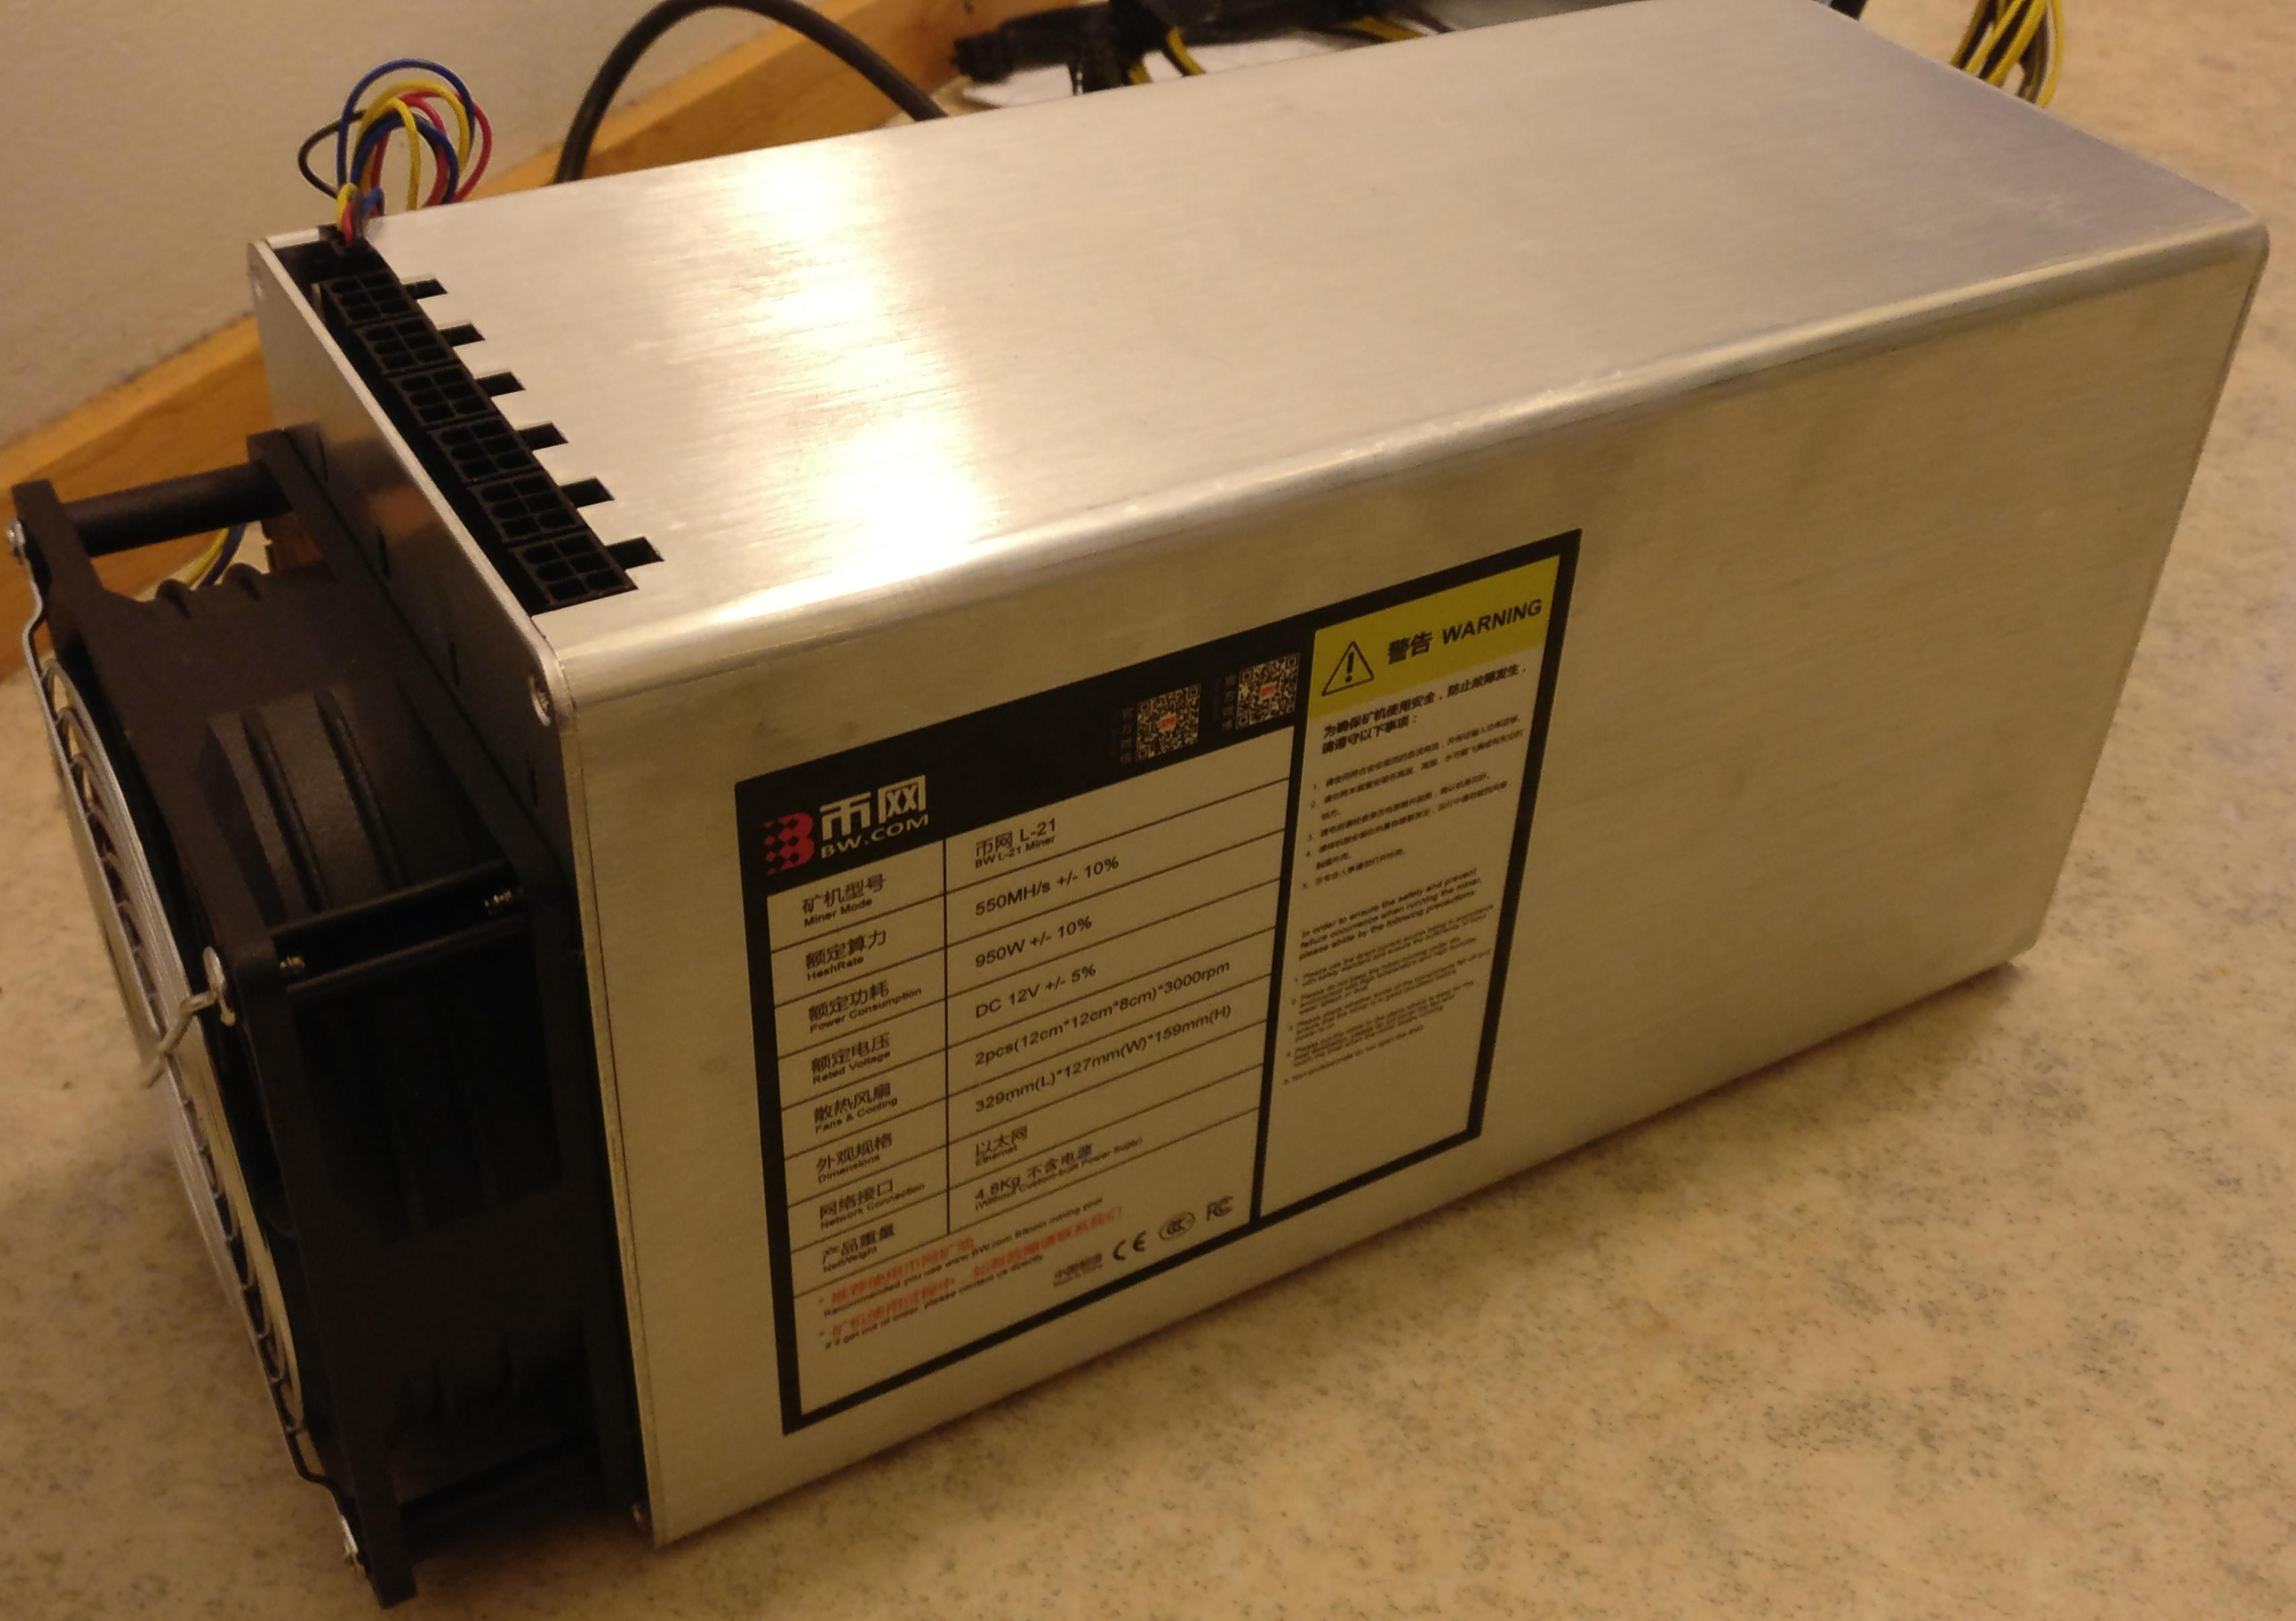 Litecoin rig cooling rack